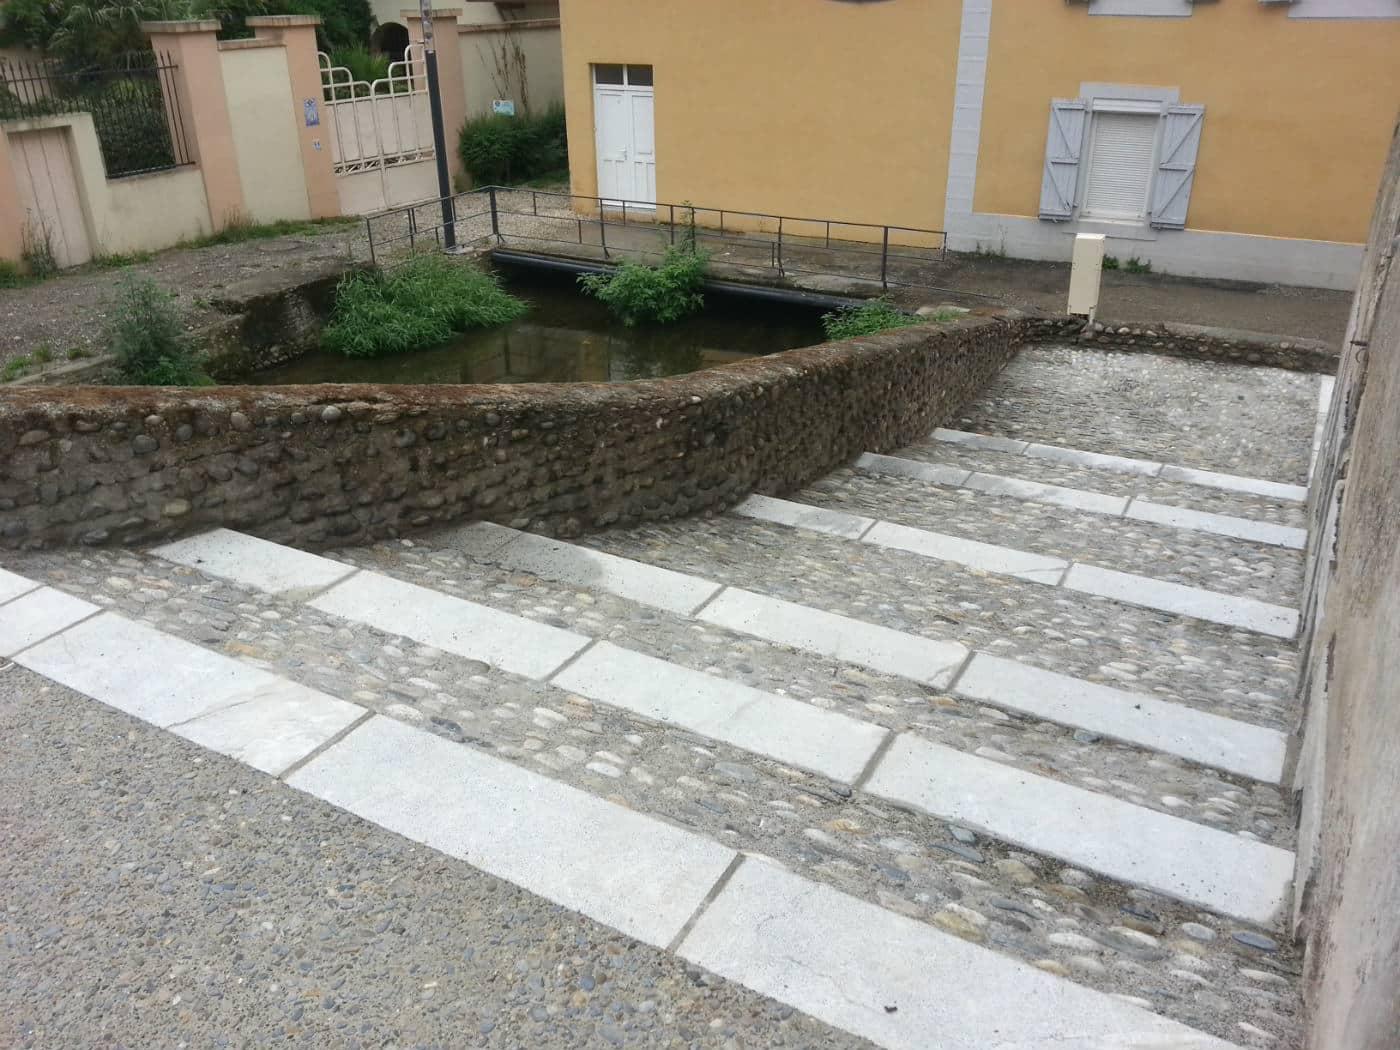 Escalier en bordure du canal